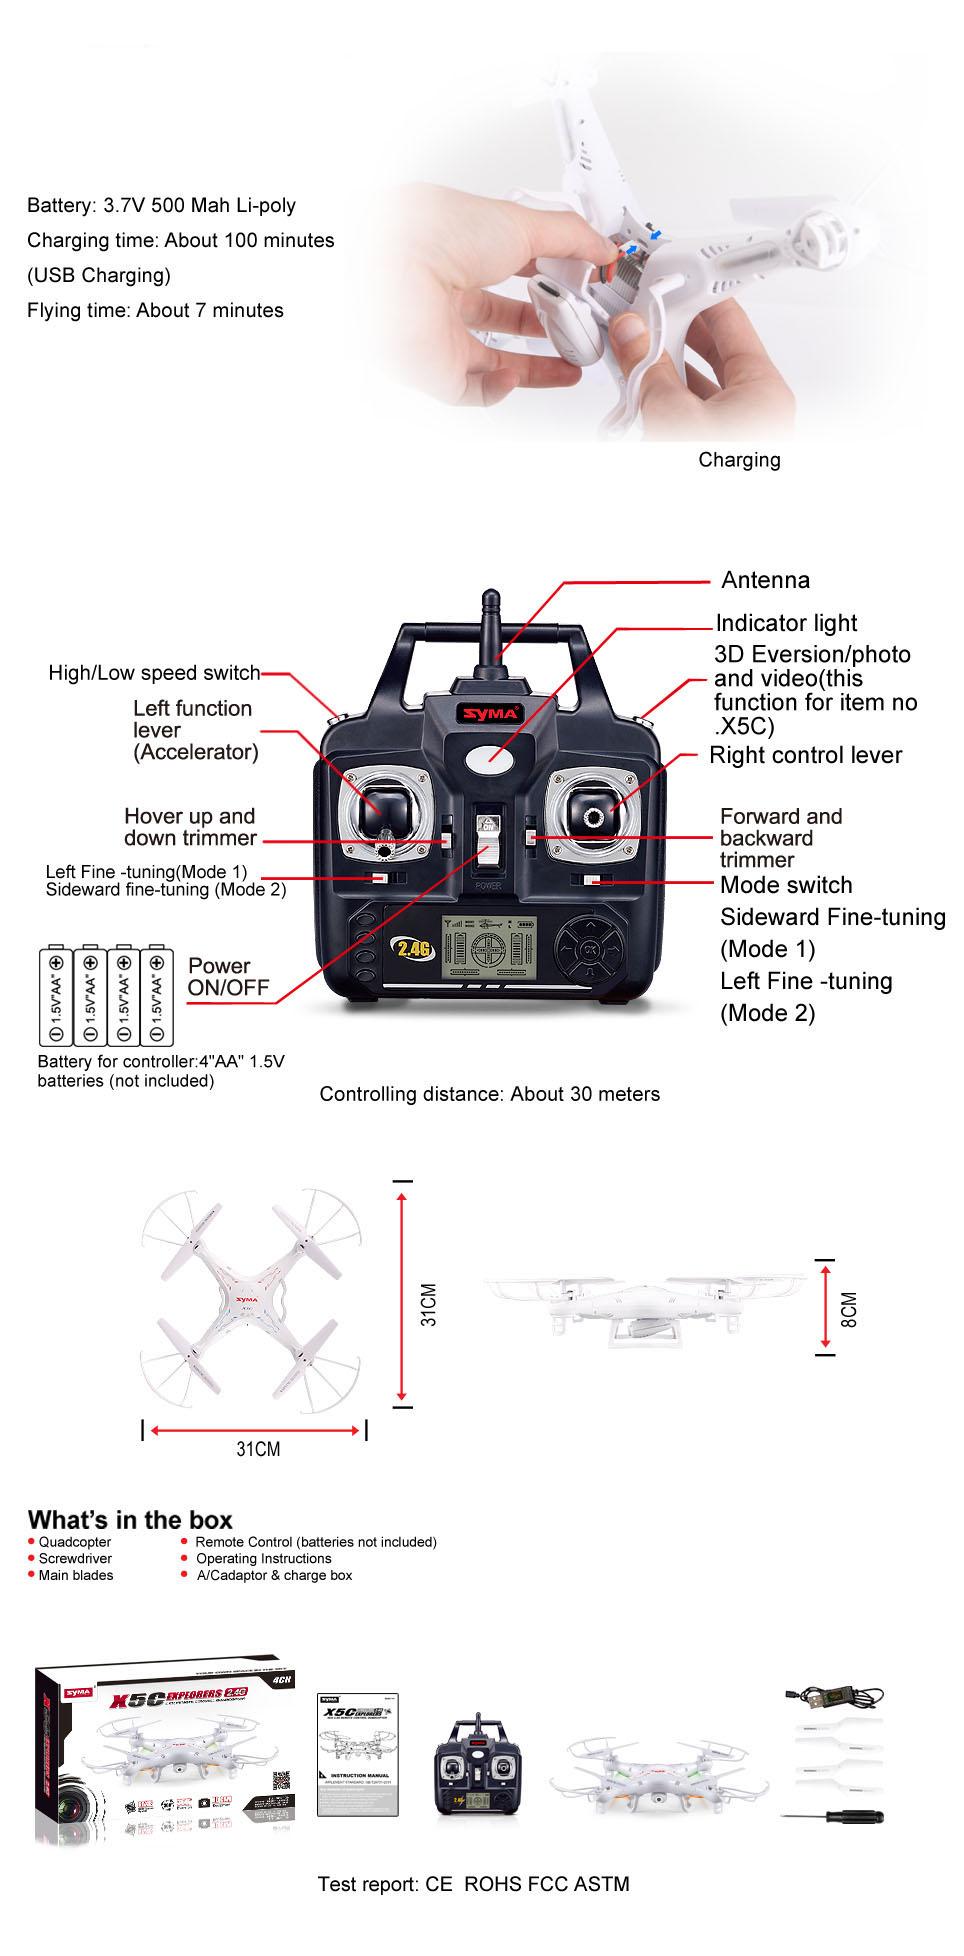 Syma X5c Quadrocopter Syma X5c Rc Helicopter Symarc X5c